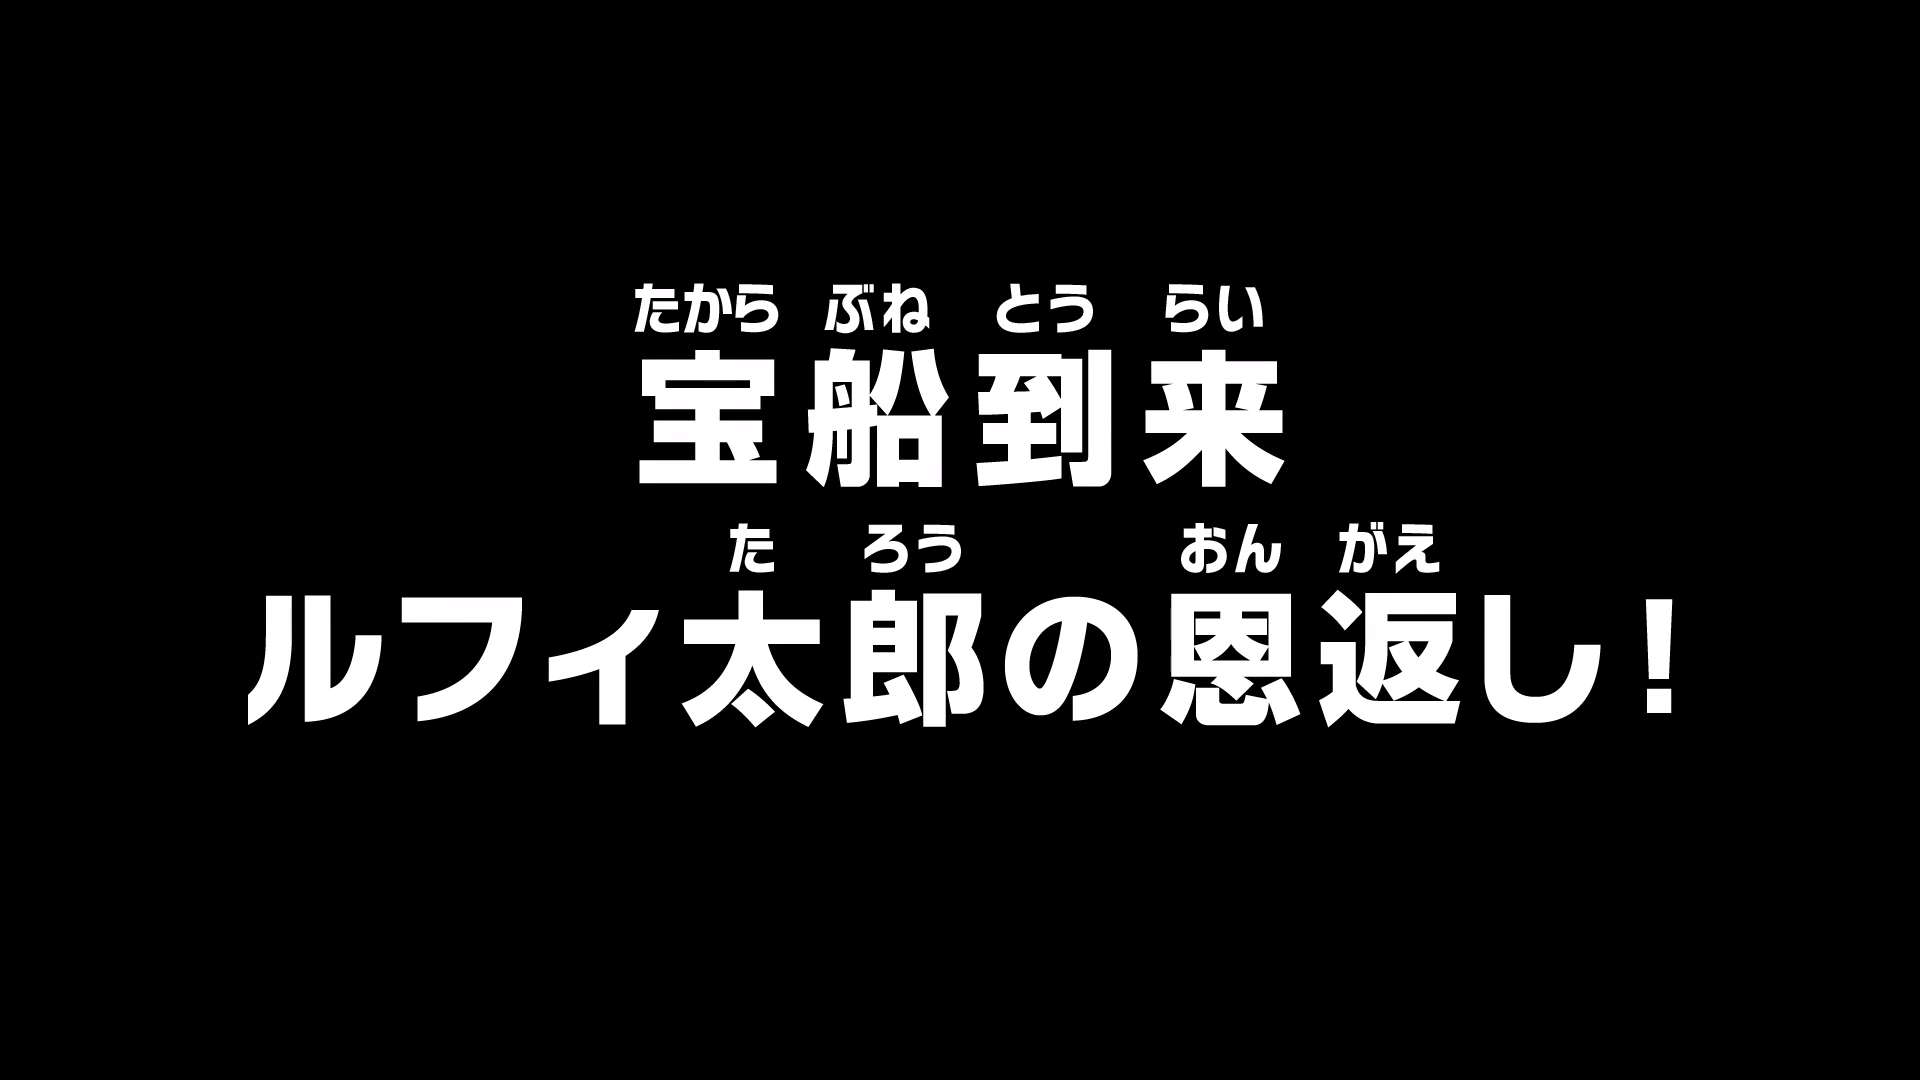 Episode 908